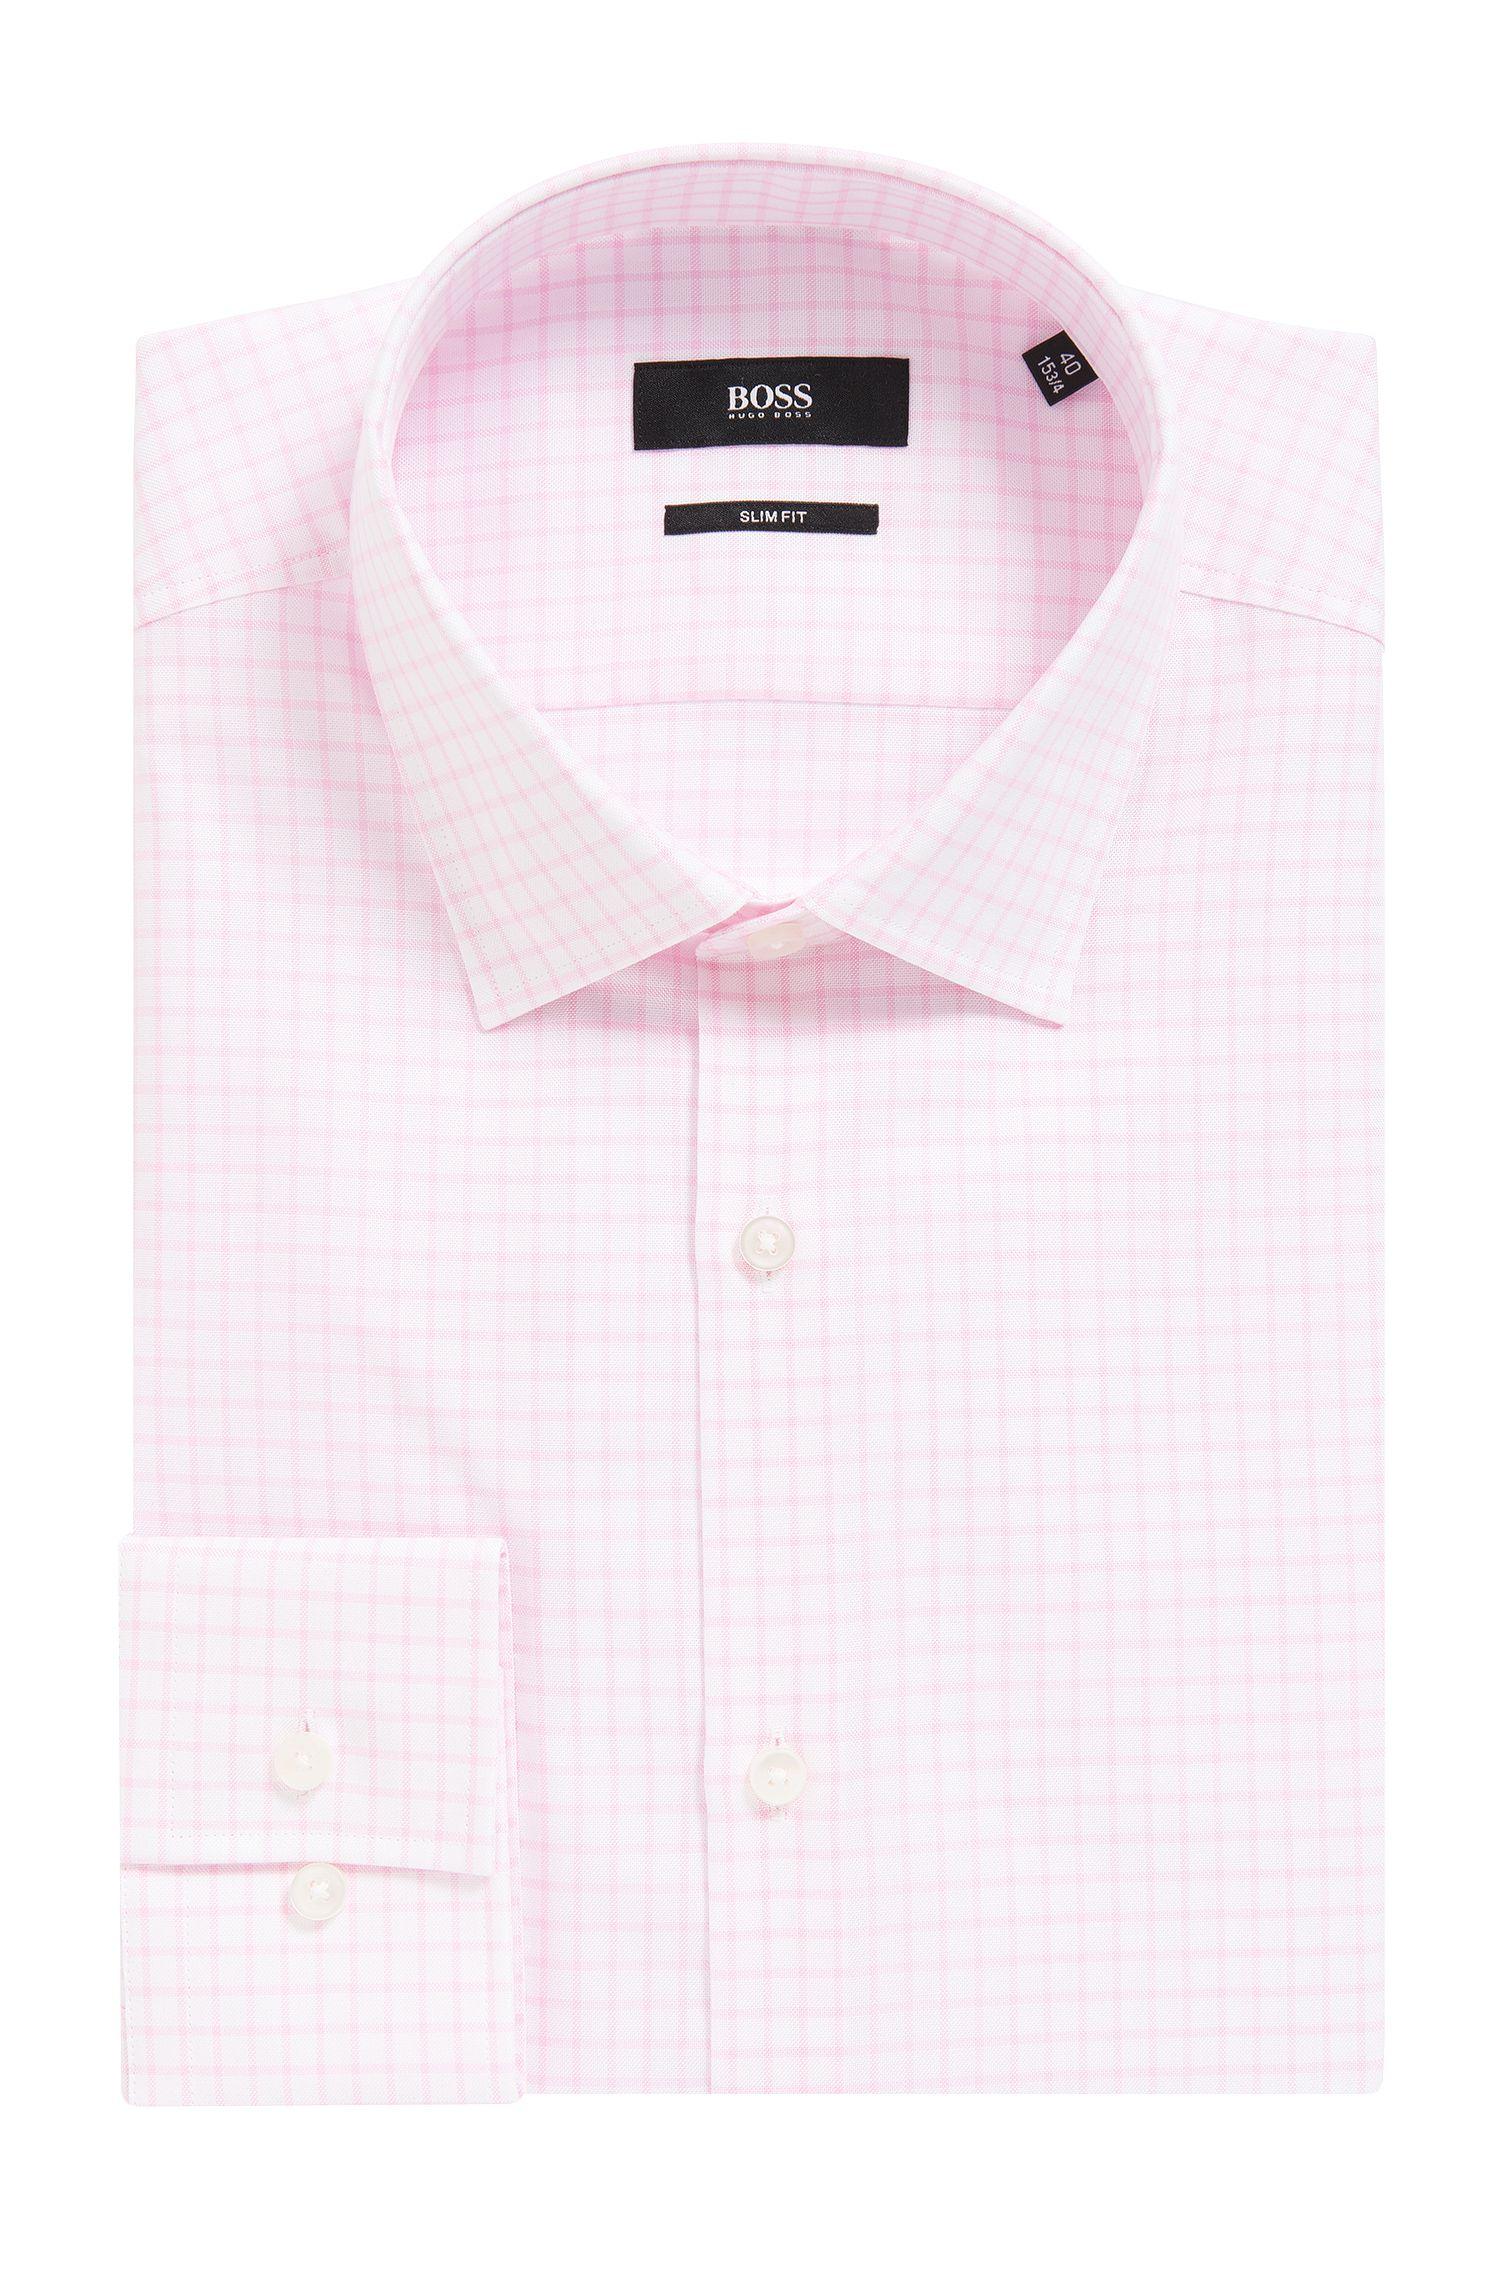 Check Cotton Dress Shirt, Slim Fit | Jenno